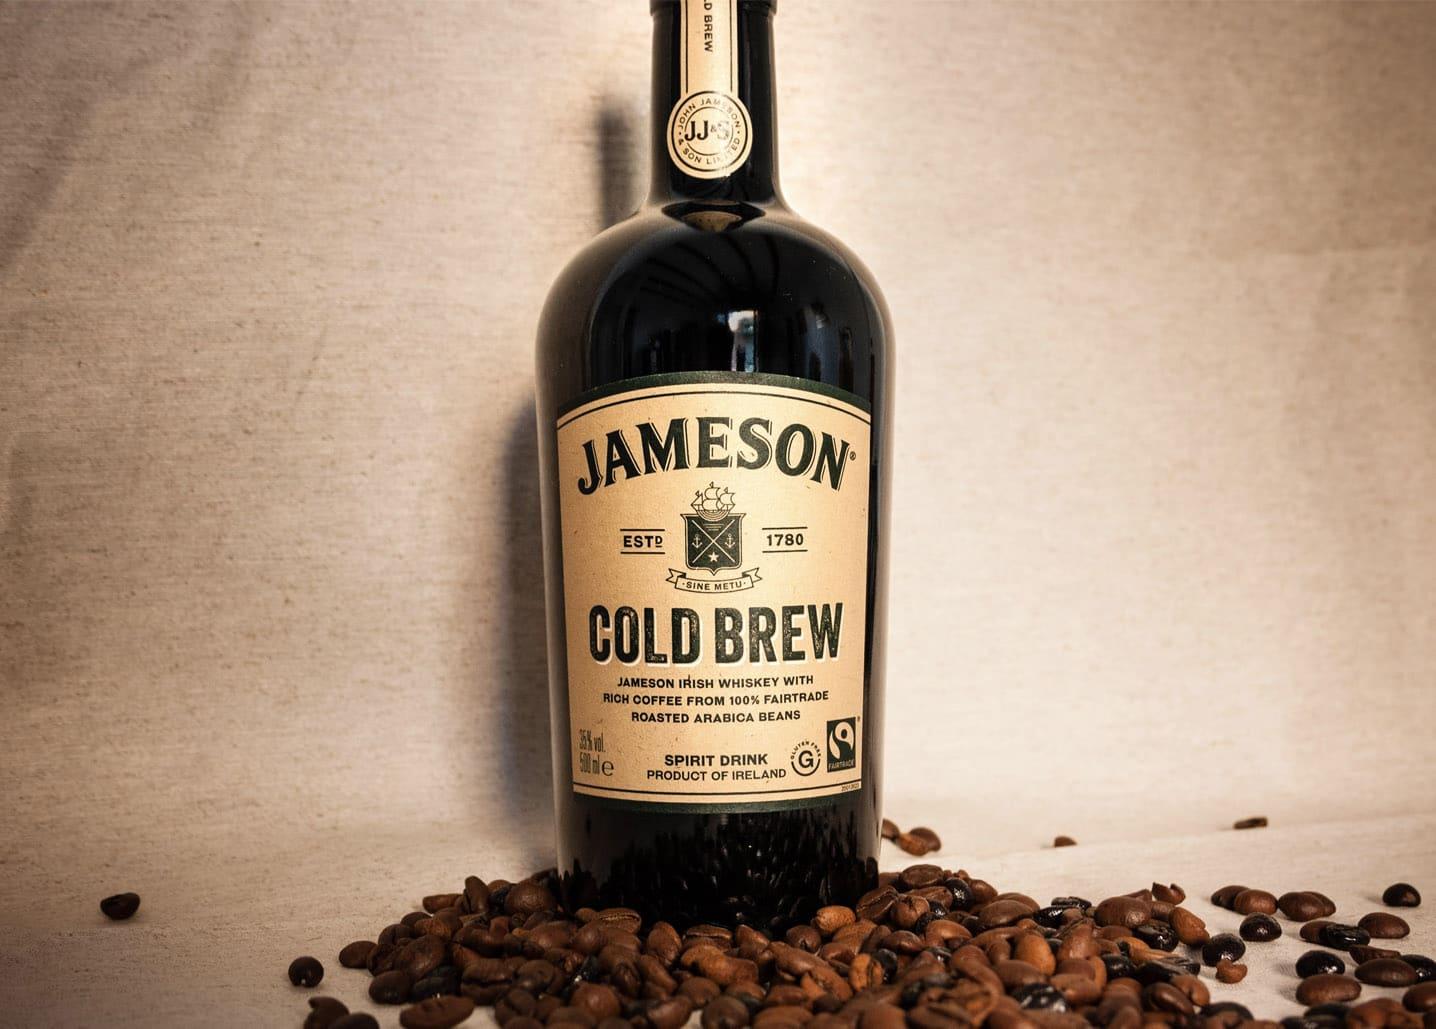 Jameson Cold Brew - Todo Whisky